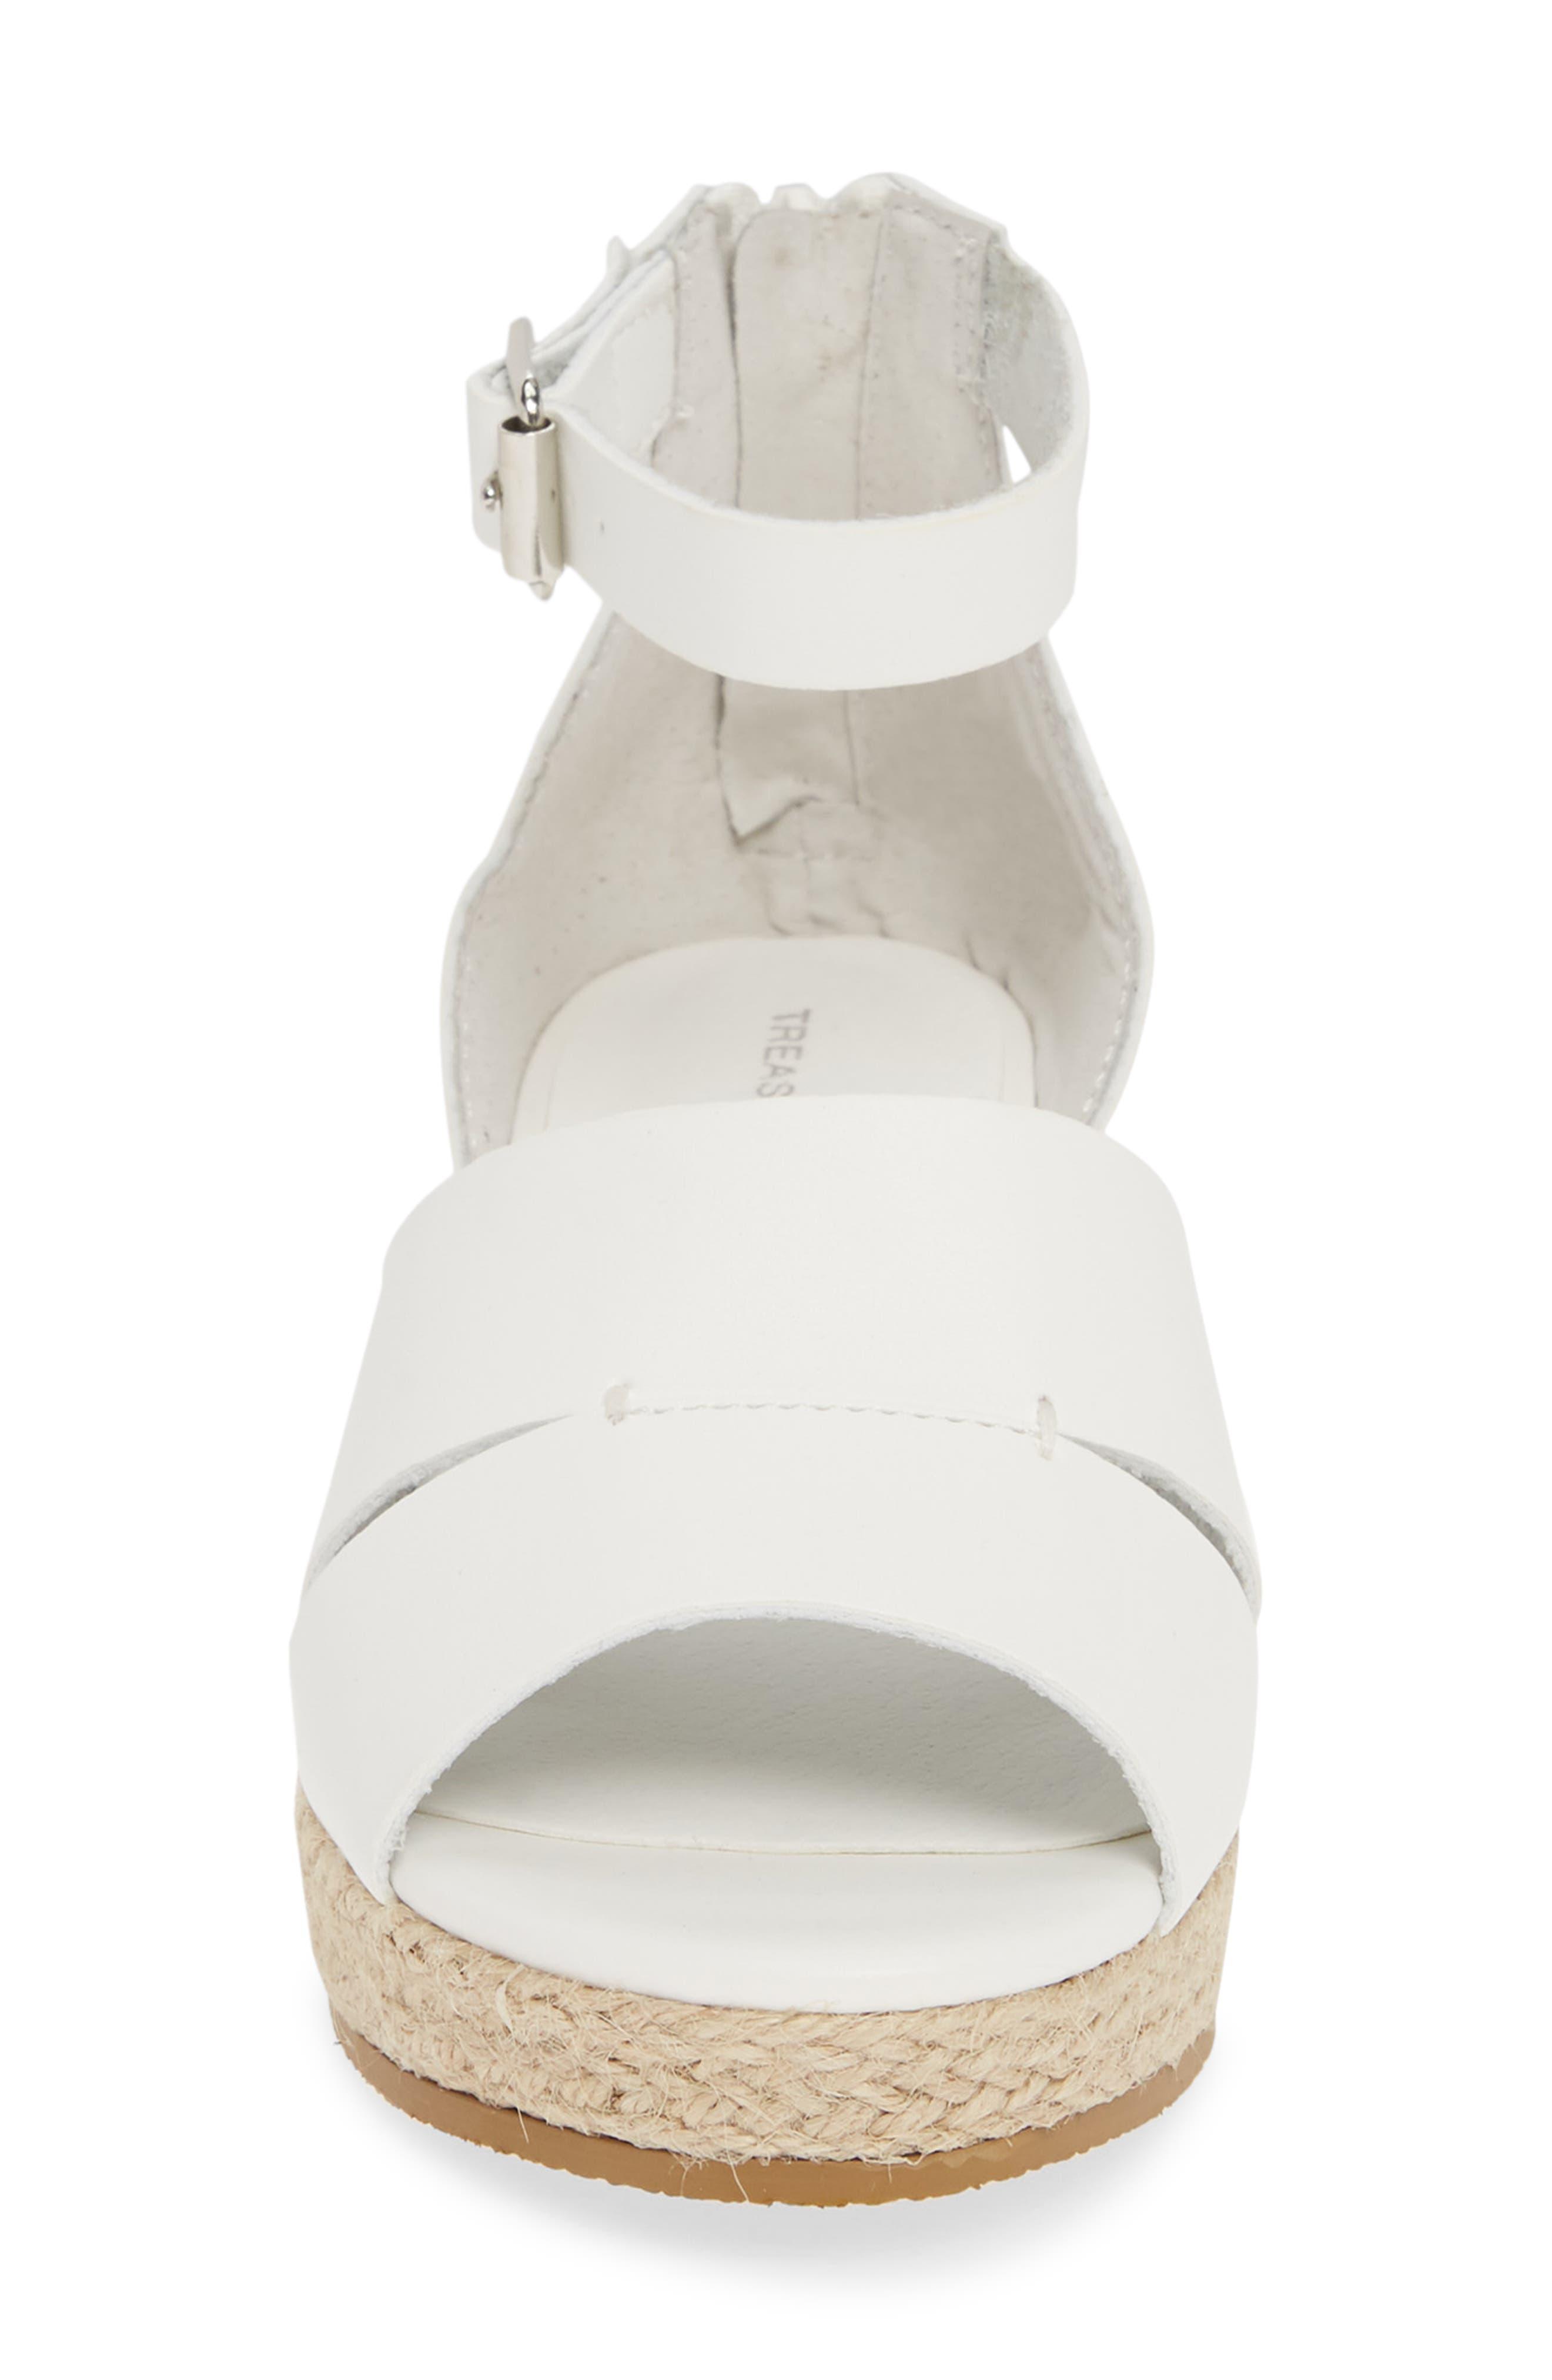 TREASURE & BOND, Espadrille Wedge Sandal, Alternate thumbnail 4, color, WHITE FAUX LEATHER